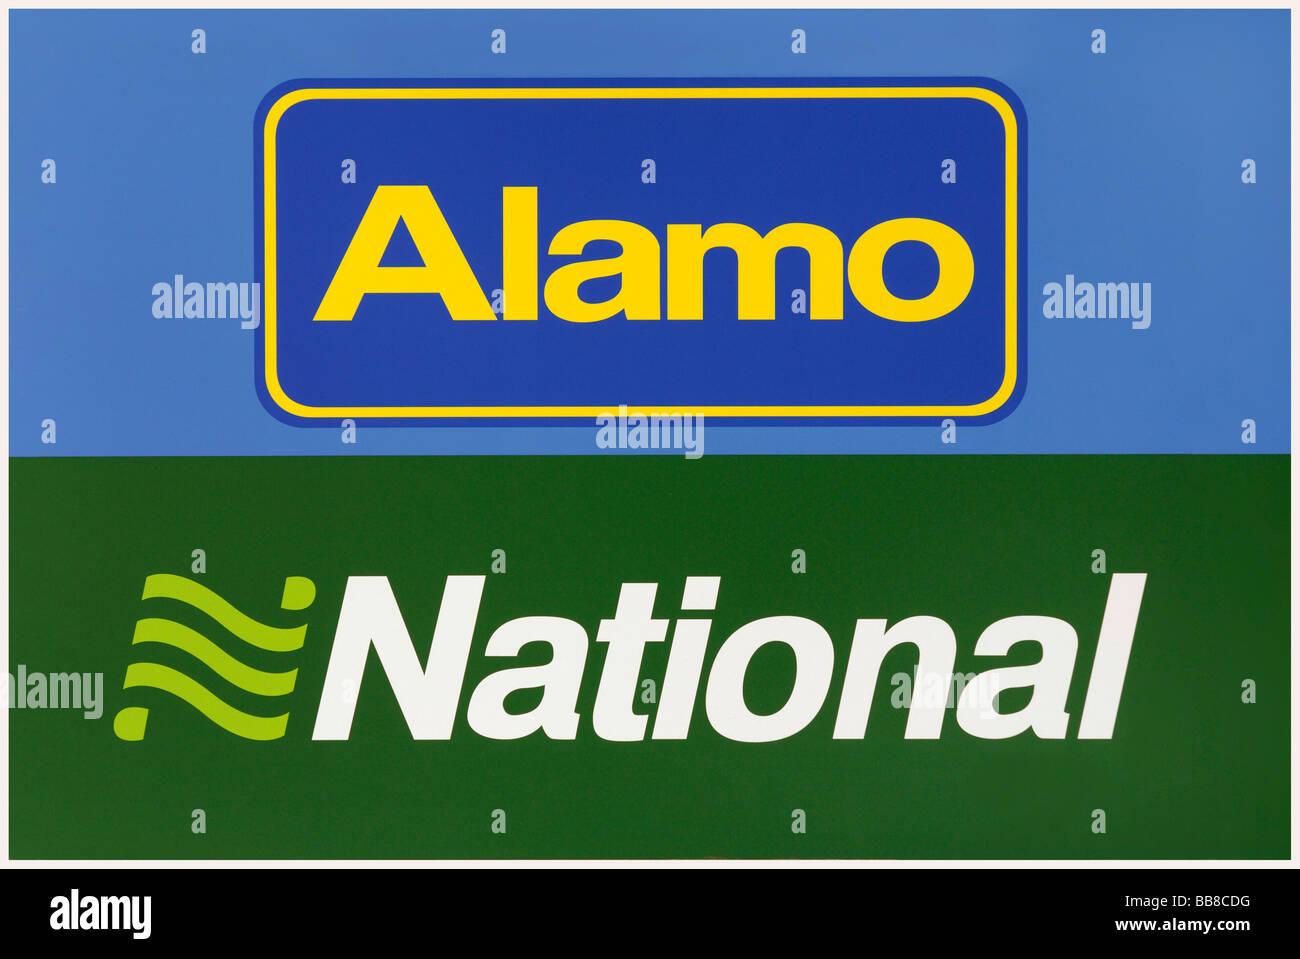 Alamo National Car Rental Service, location de voitures Photo Stock